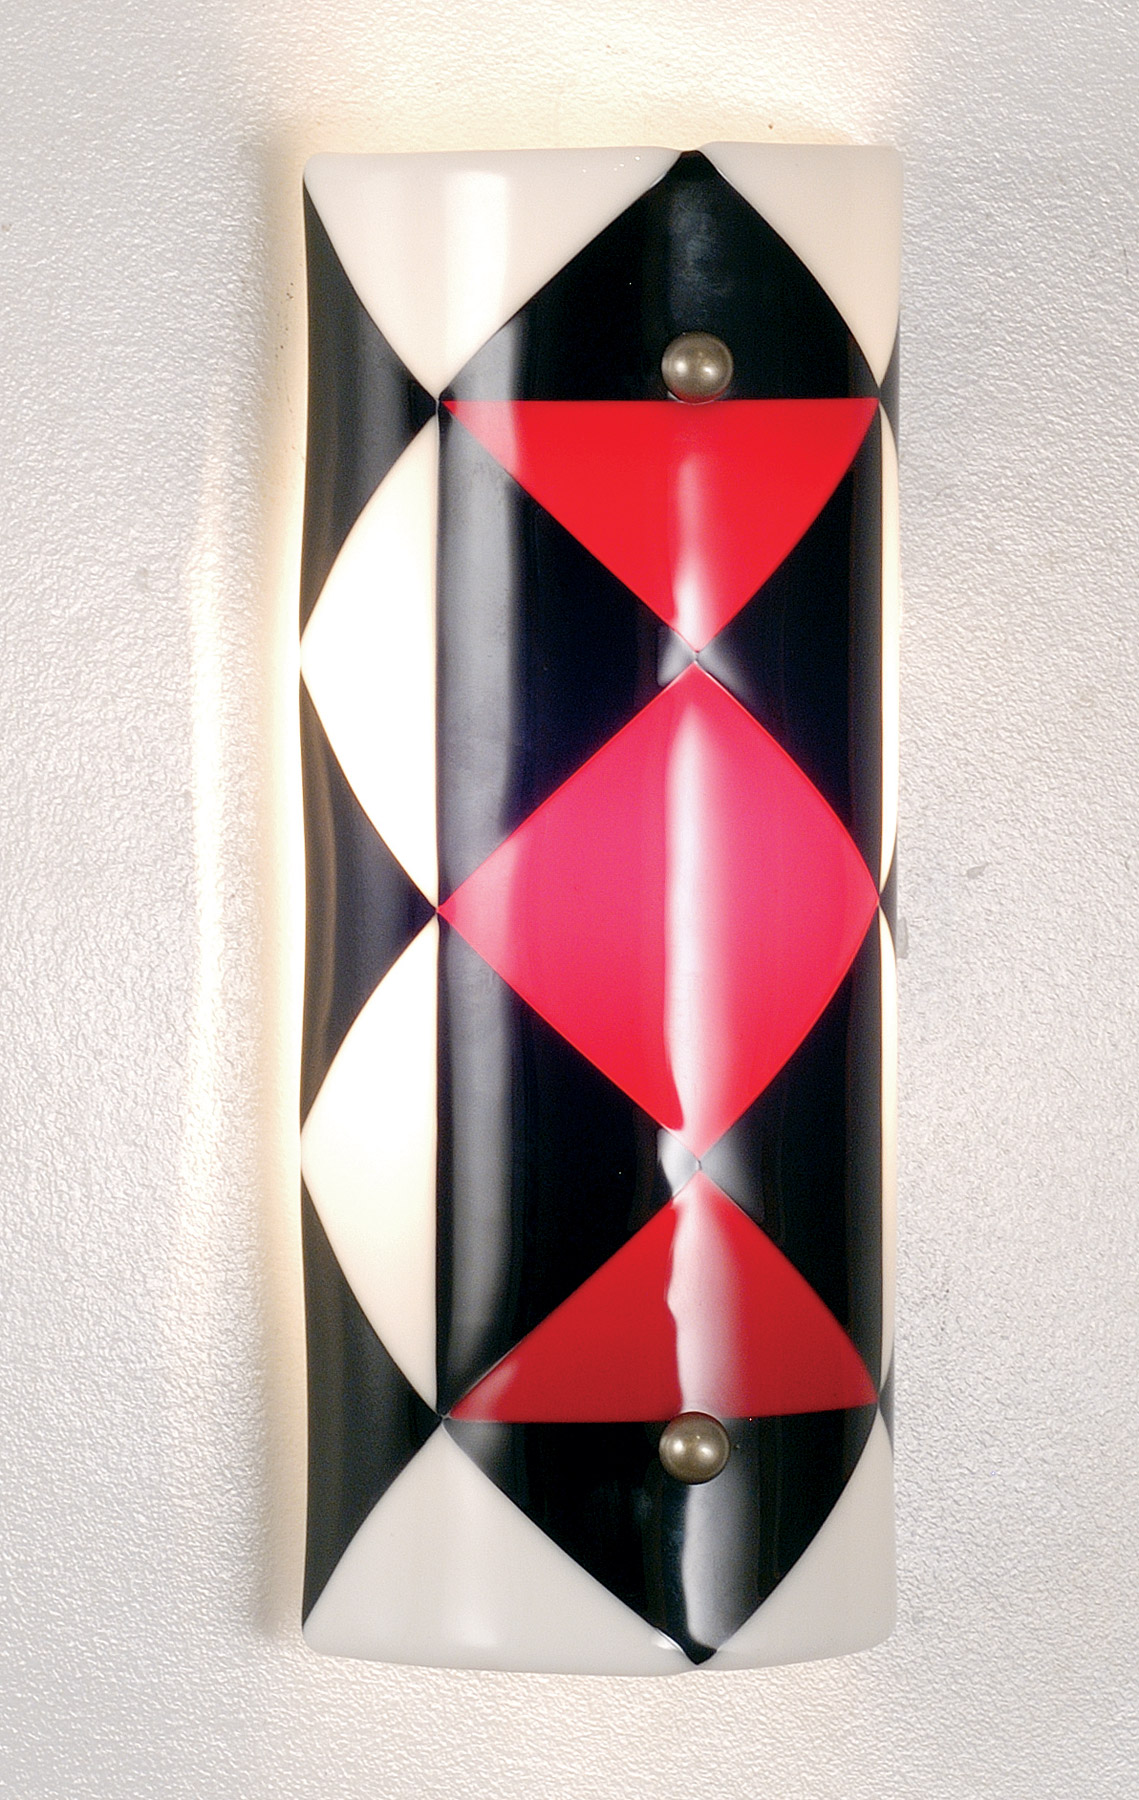 Meyda 82560 Jester Fused Glass Wall Sconce